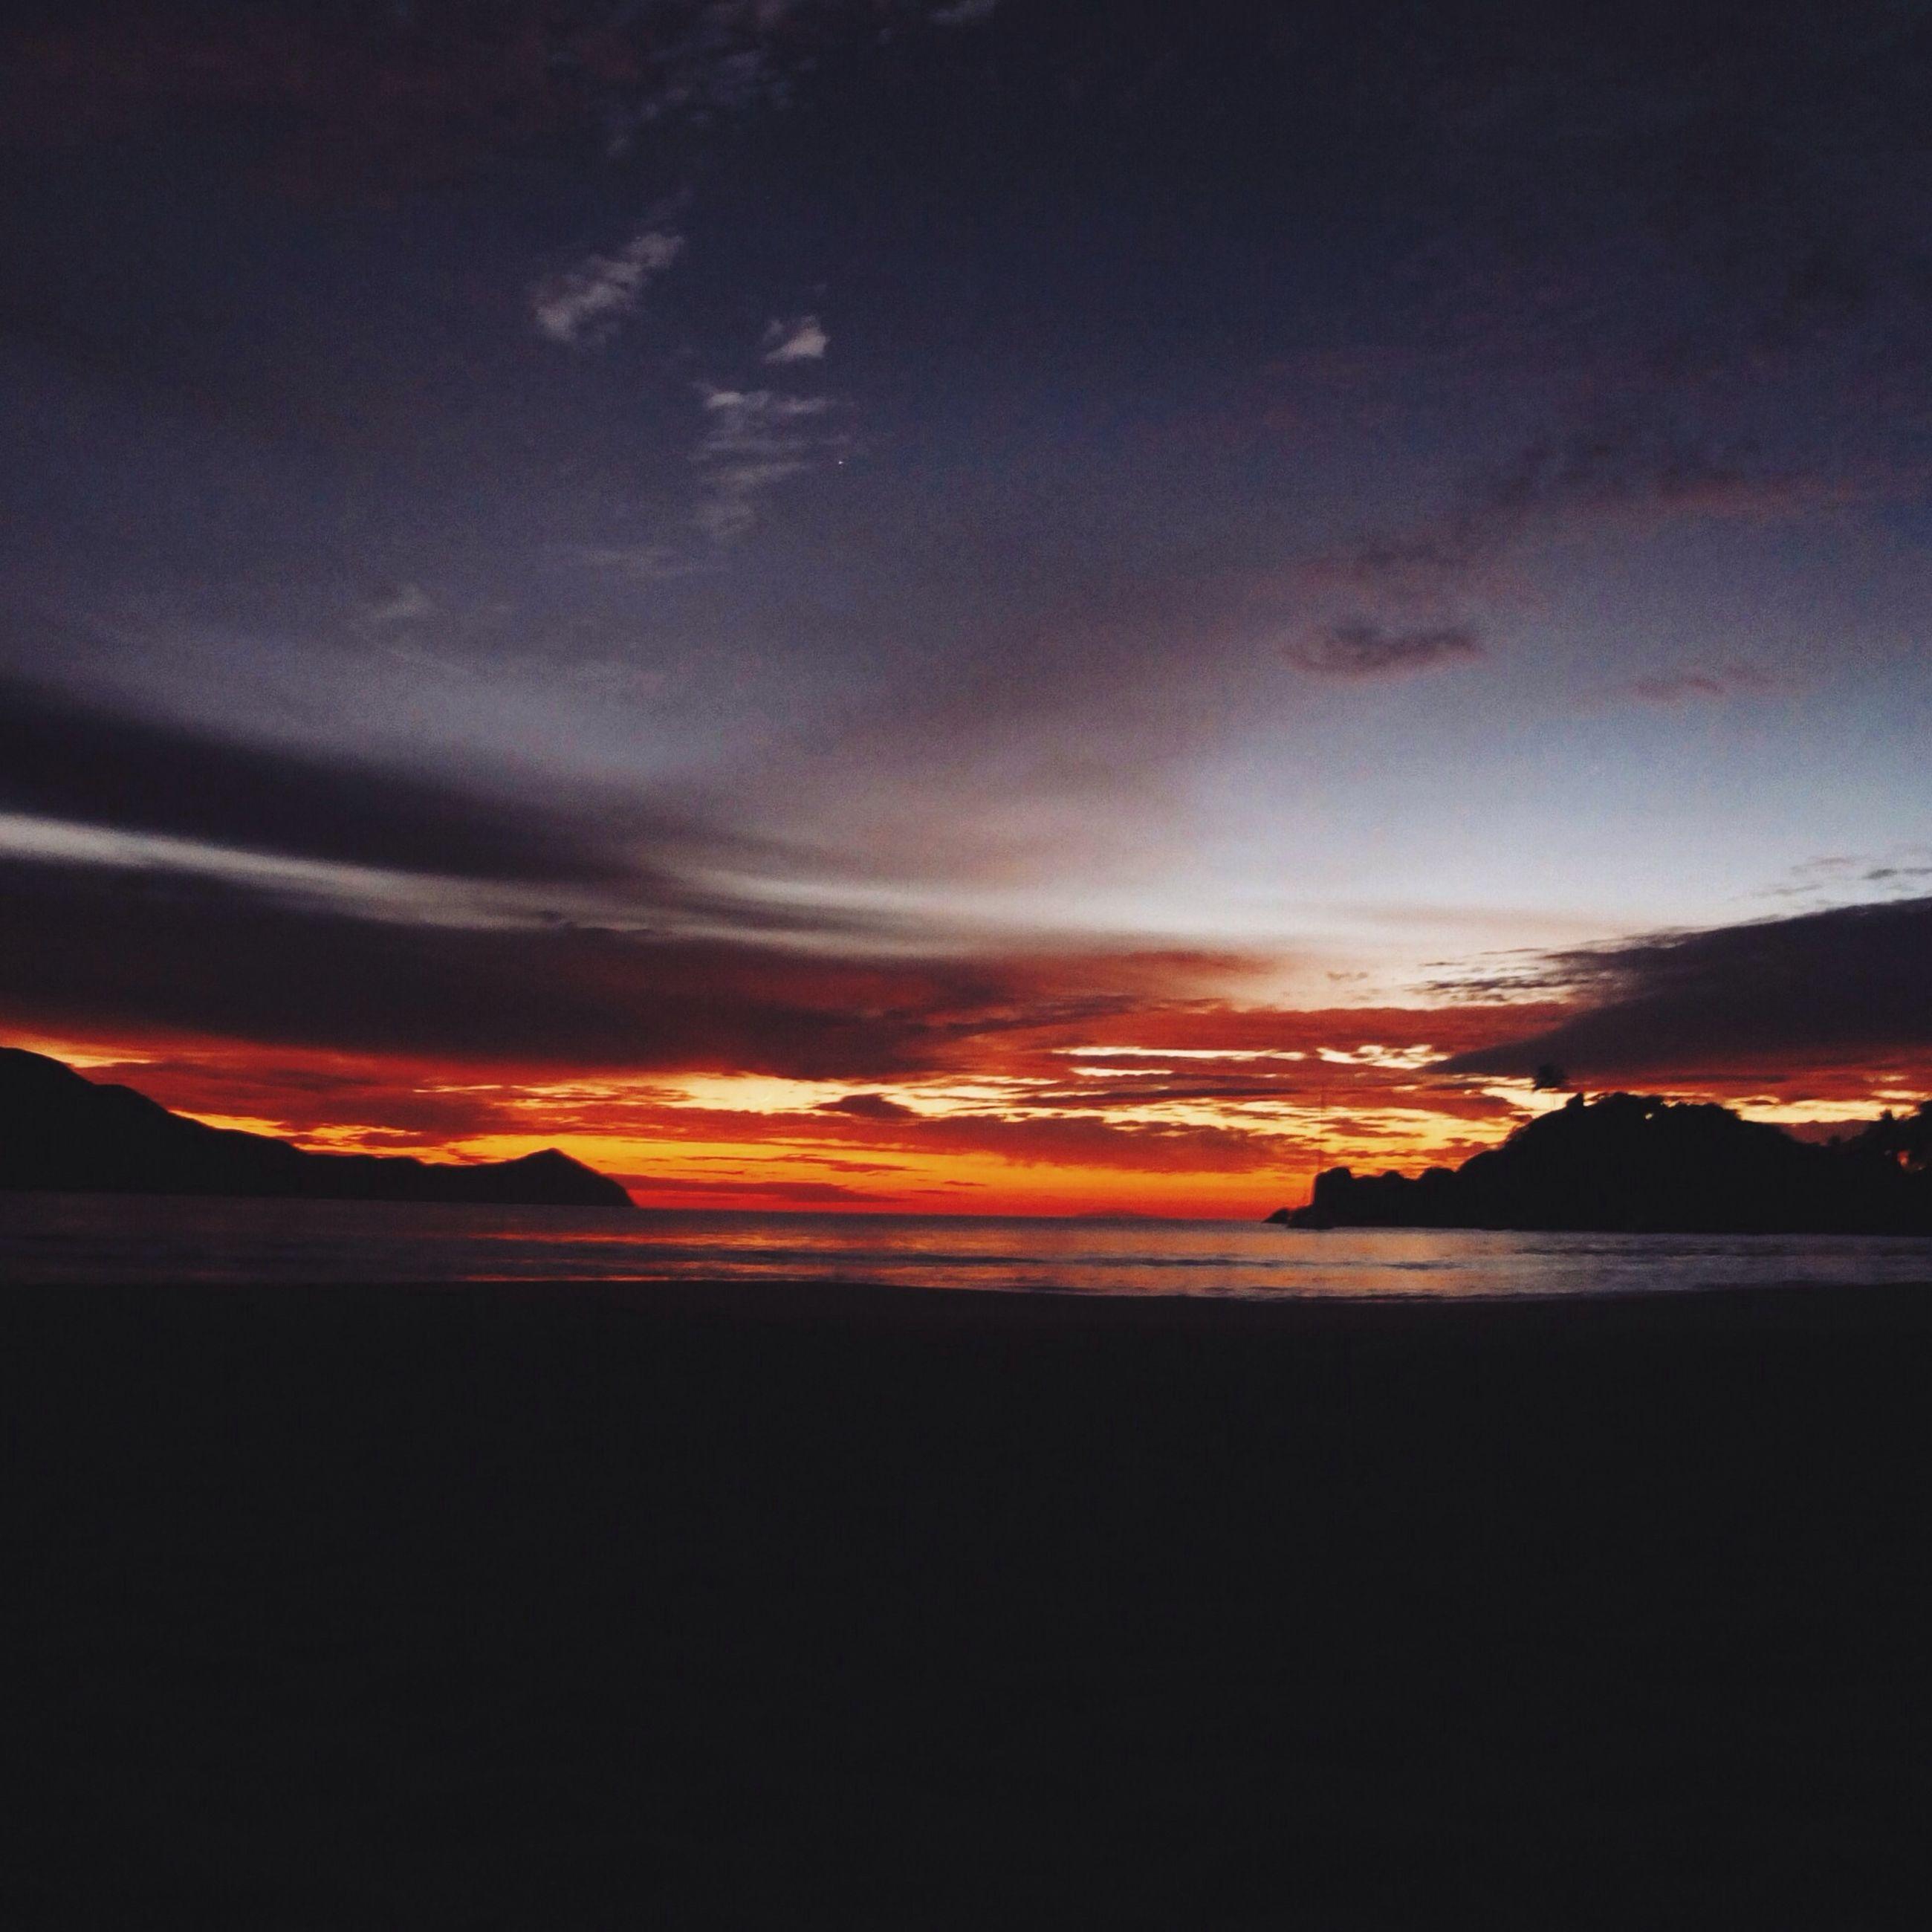 sunset, orange color, scenics, sky, tranquil scene, beauty in nature, tranquility, silhouette, idyllic, nature, sea, cloud - sky, dramatic sky, dark, dusk, water, landscape, cloud, outdoors, majestic